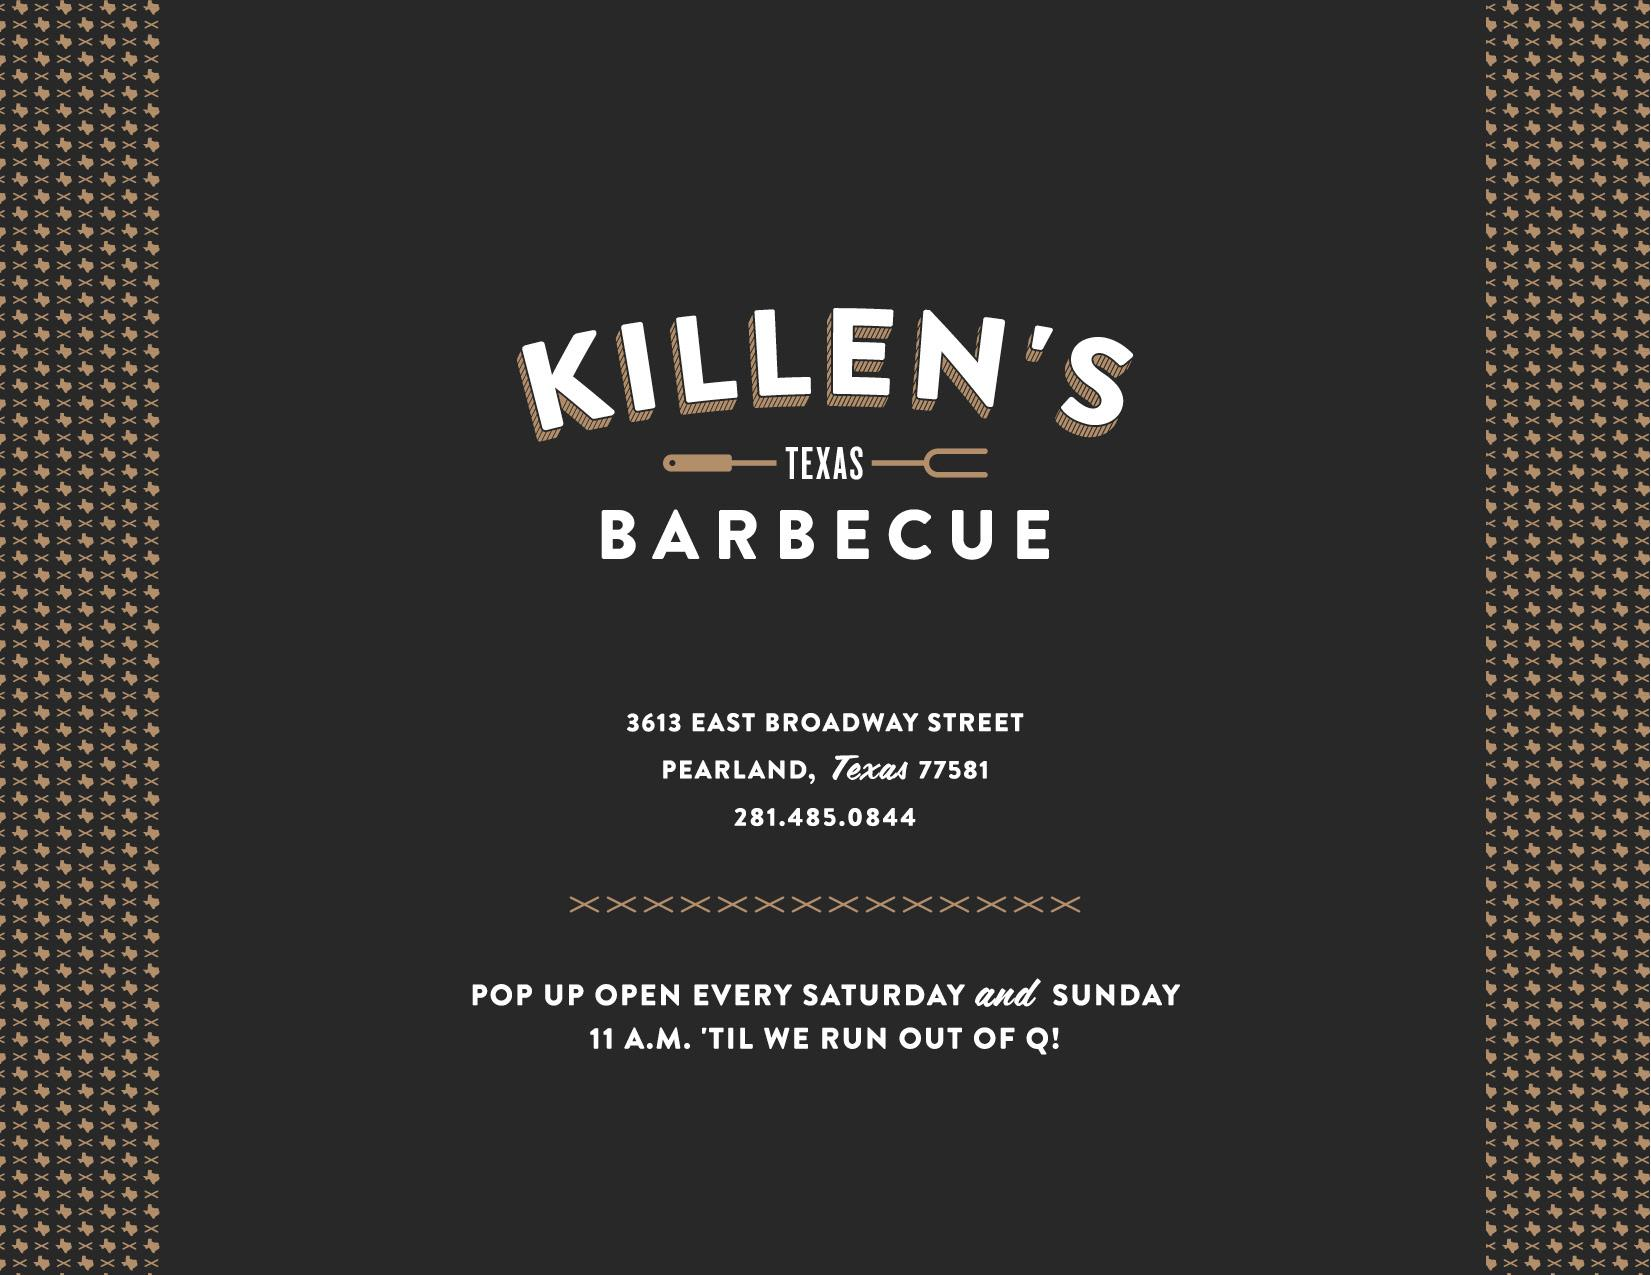 Killen's Barbecue - image 16 - student project